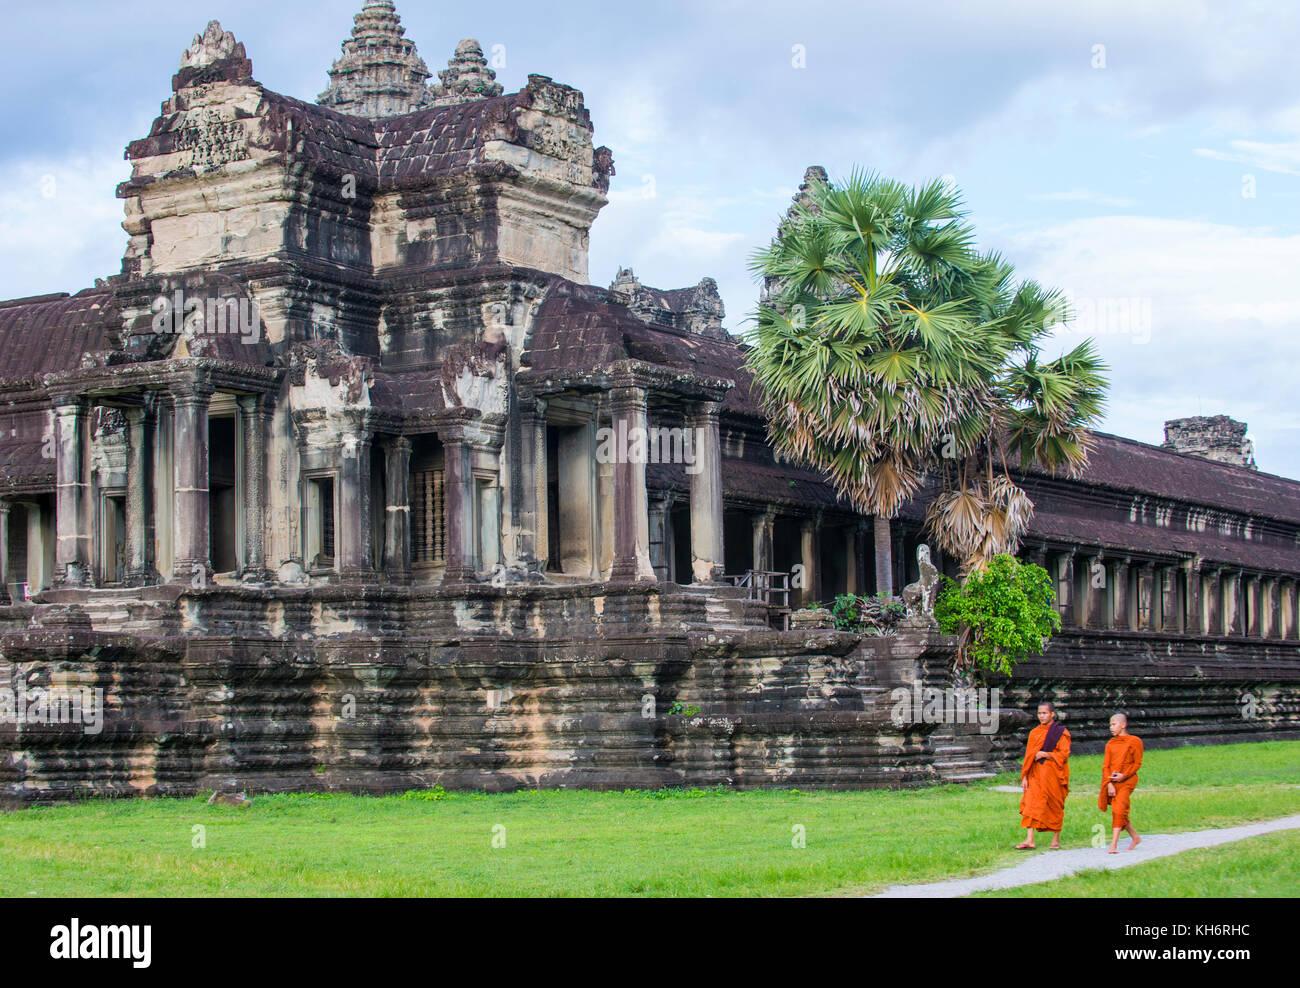 Buddhistische Mönche im Tempel Angkor Wat in Kambodscha Siem Reap Stockfoto